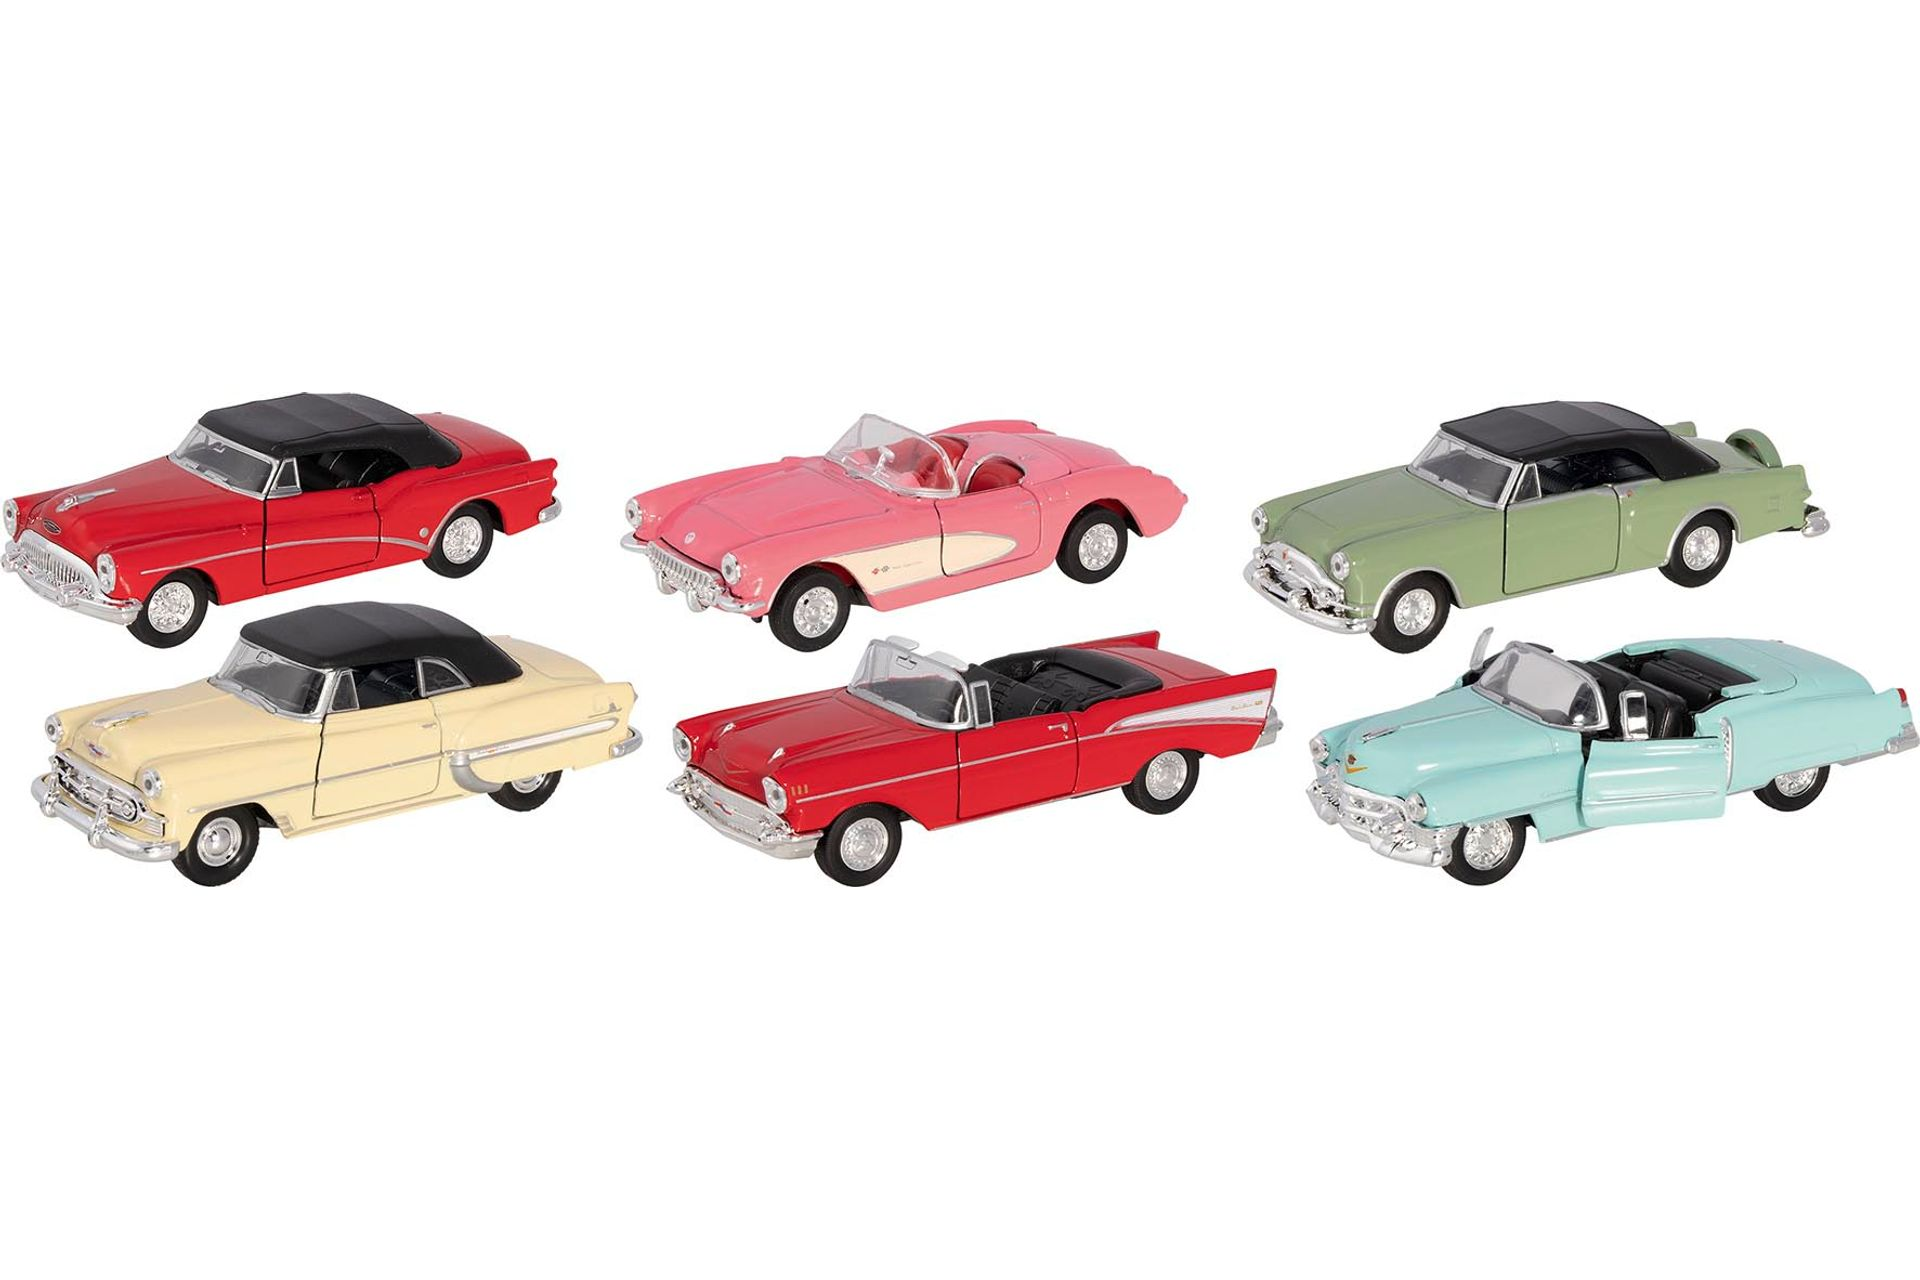 Masinuta - Oldtimer Collection US (mai multe modele) | Goki